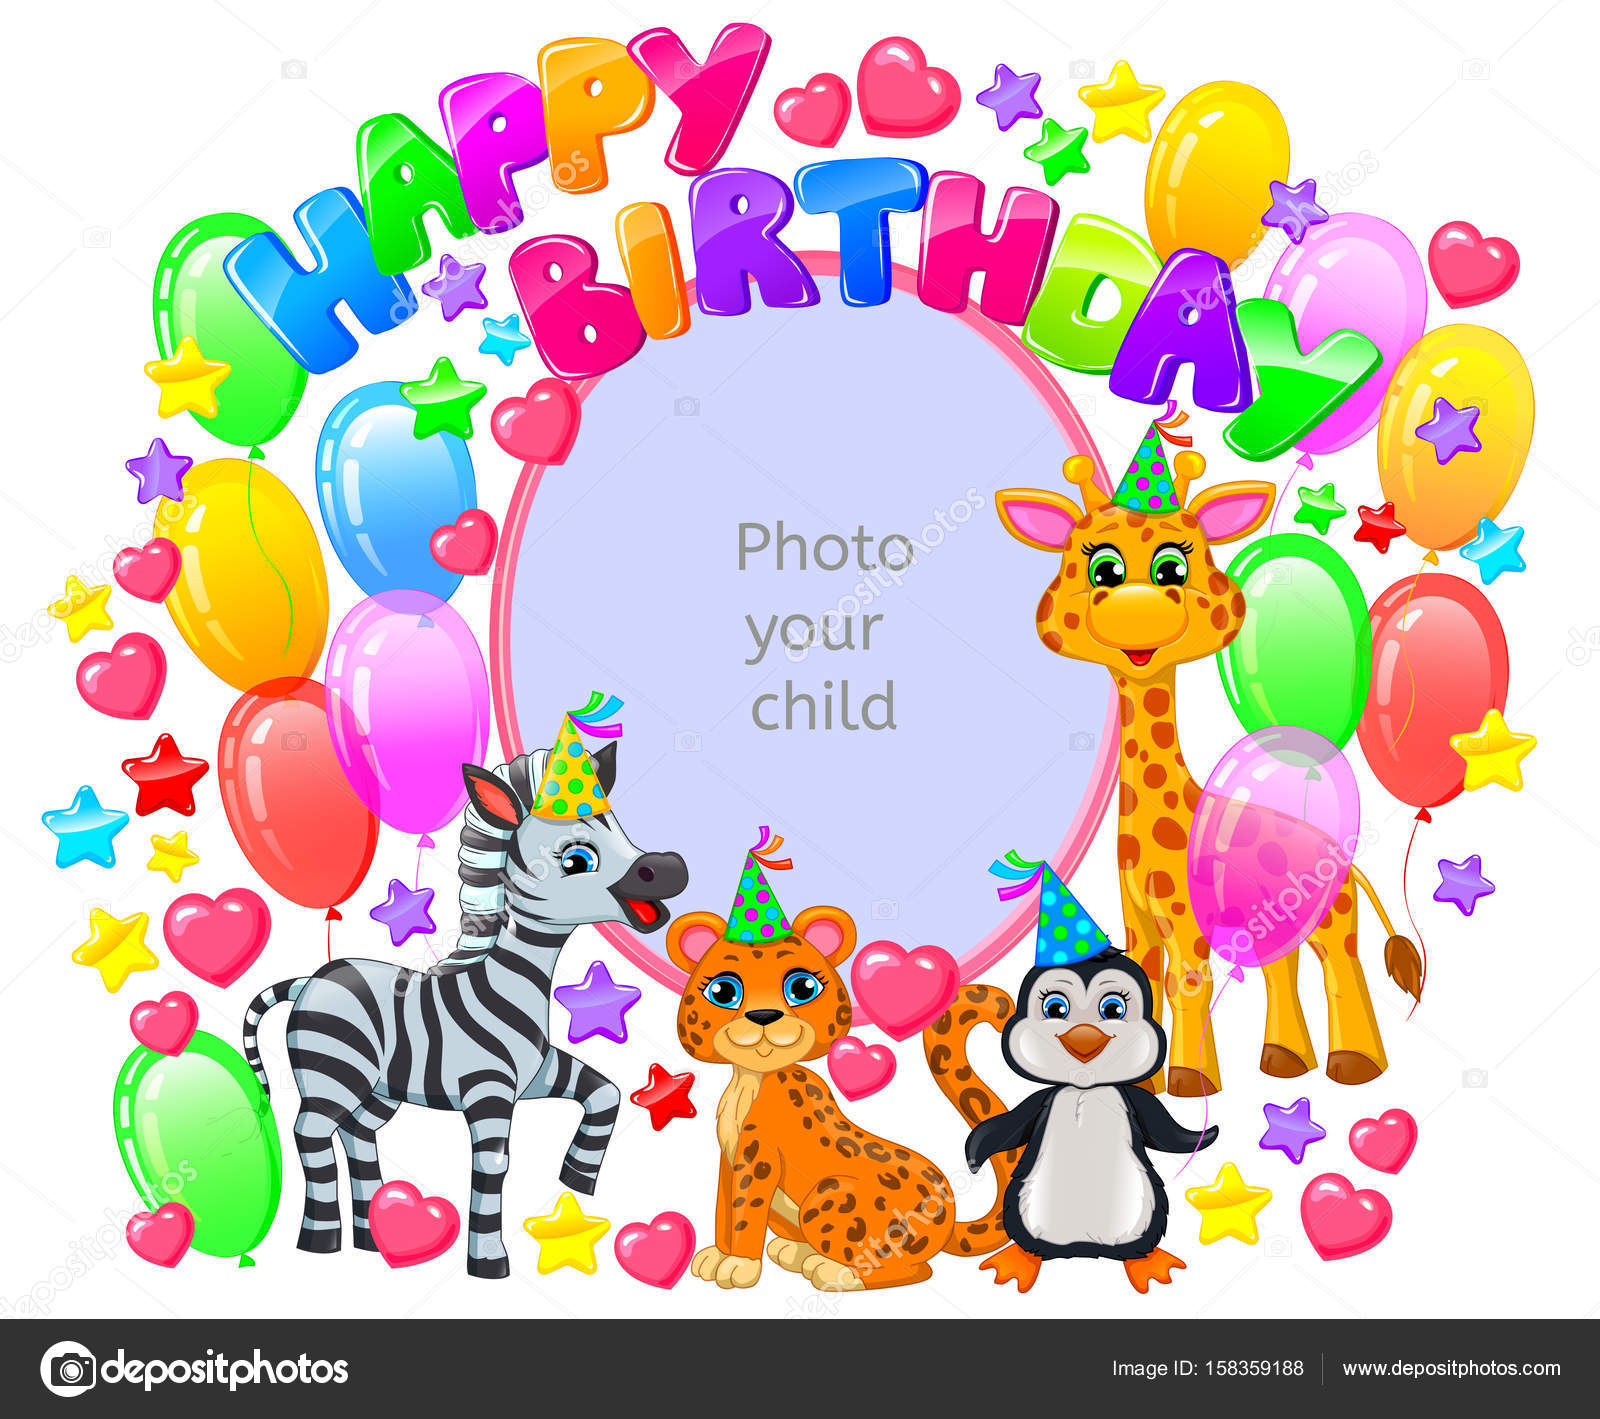 Geburtstag Rahmen Fur Ihr Babyfoto Stockvektor C Pinkkoala 158359188